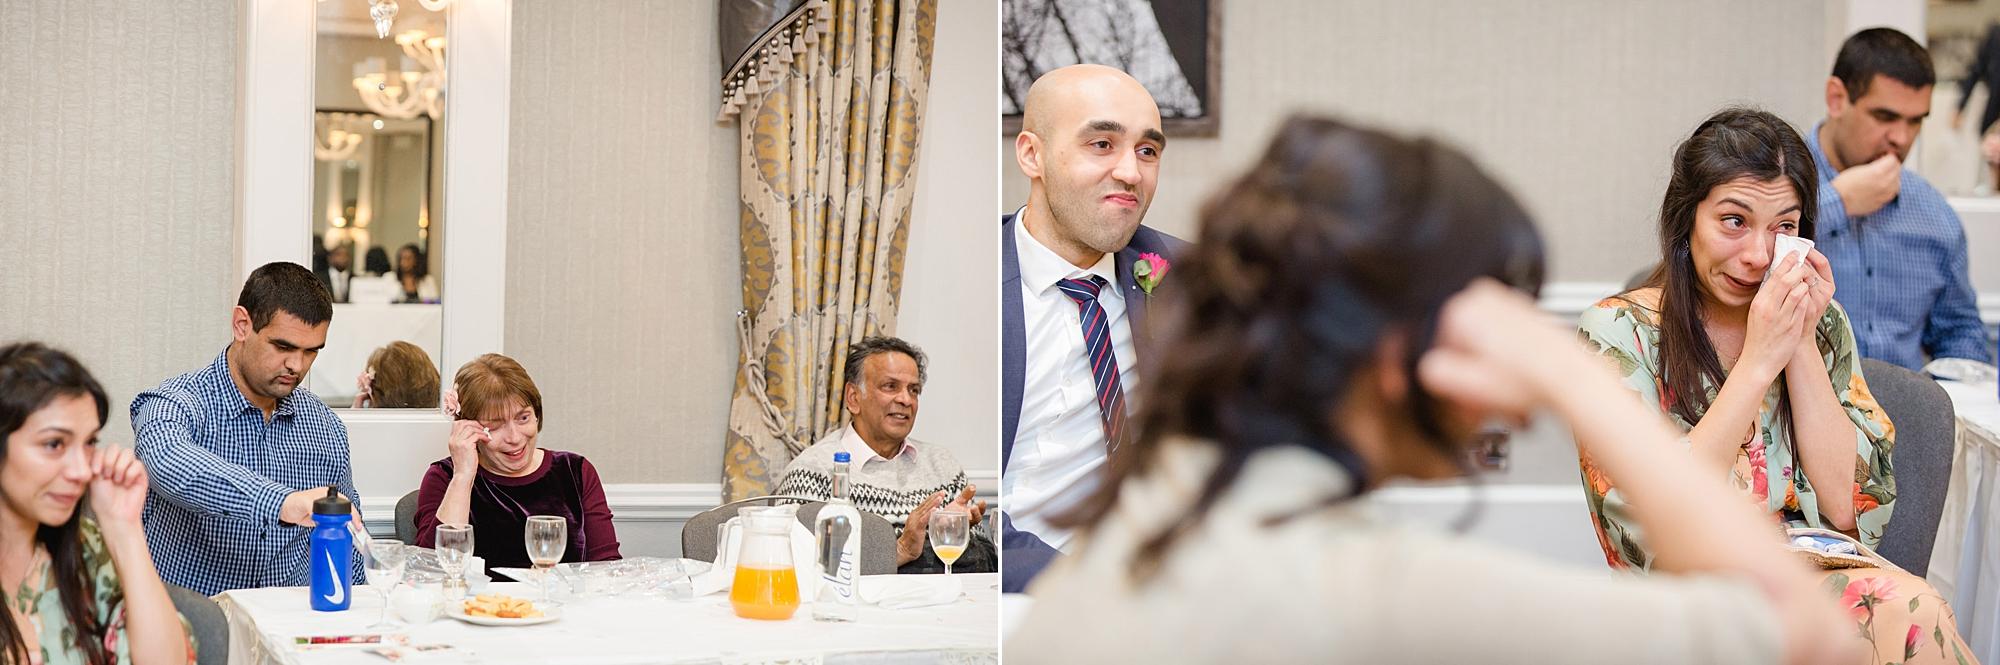 Richmond Hill Hotel wedding guests during speeches